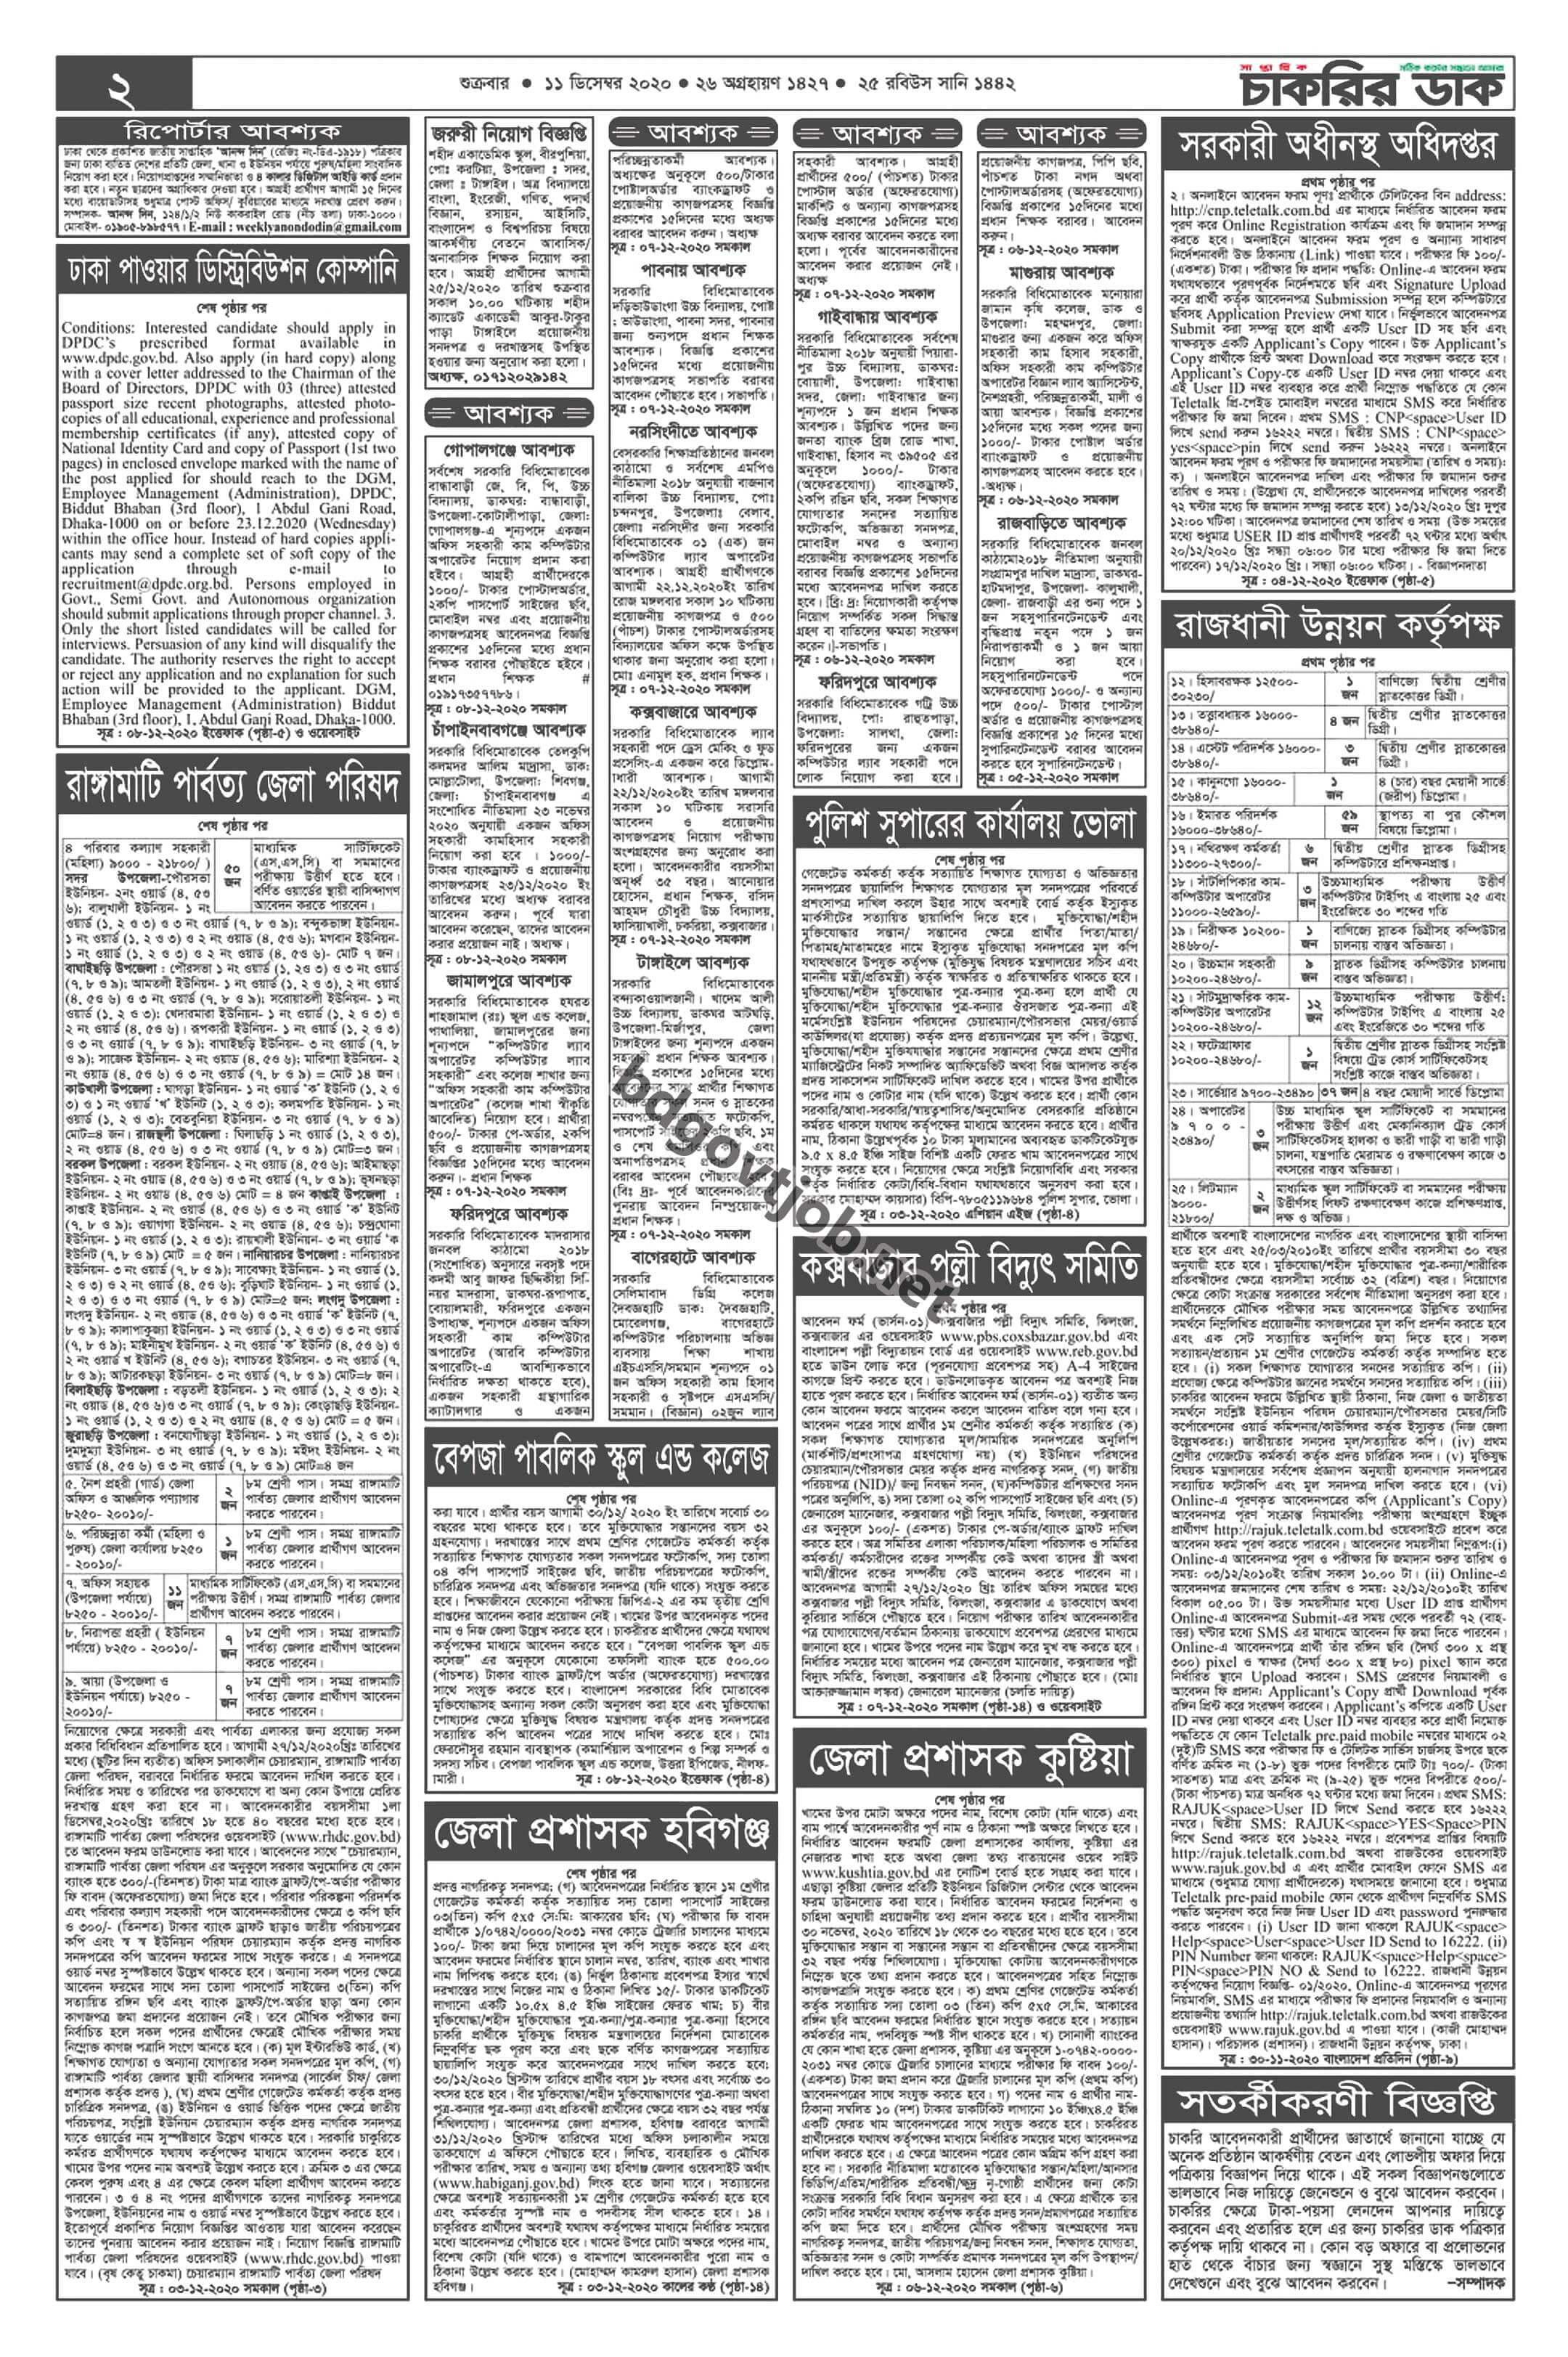 Chakrir Dak Weekly Jobs Newspaper 11 December 2020